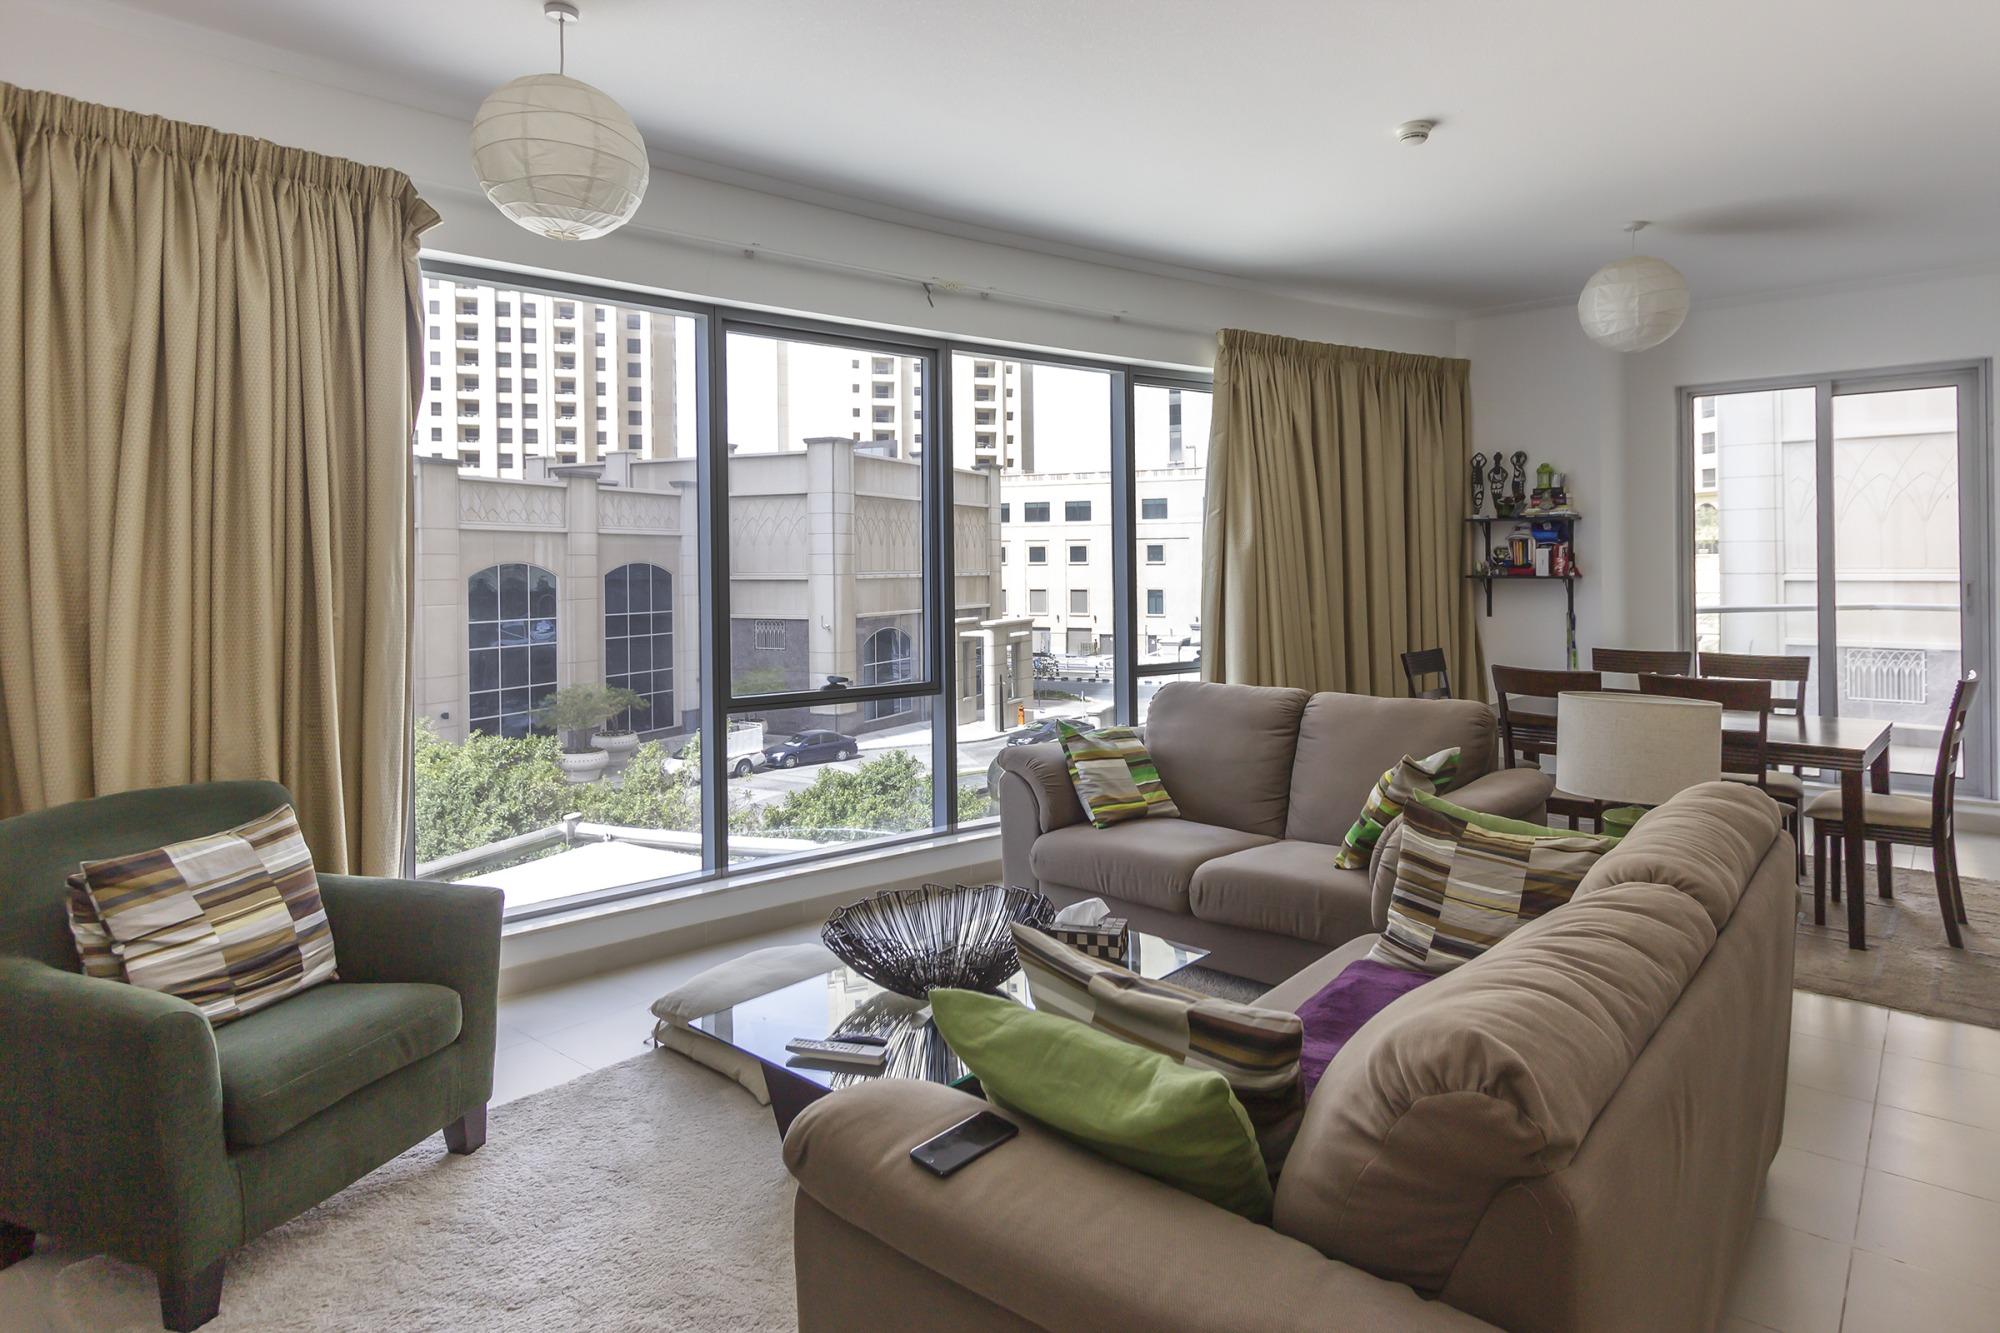 1 Bed | 4 Cheques | Promenade | Walk-in Closet